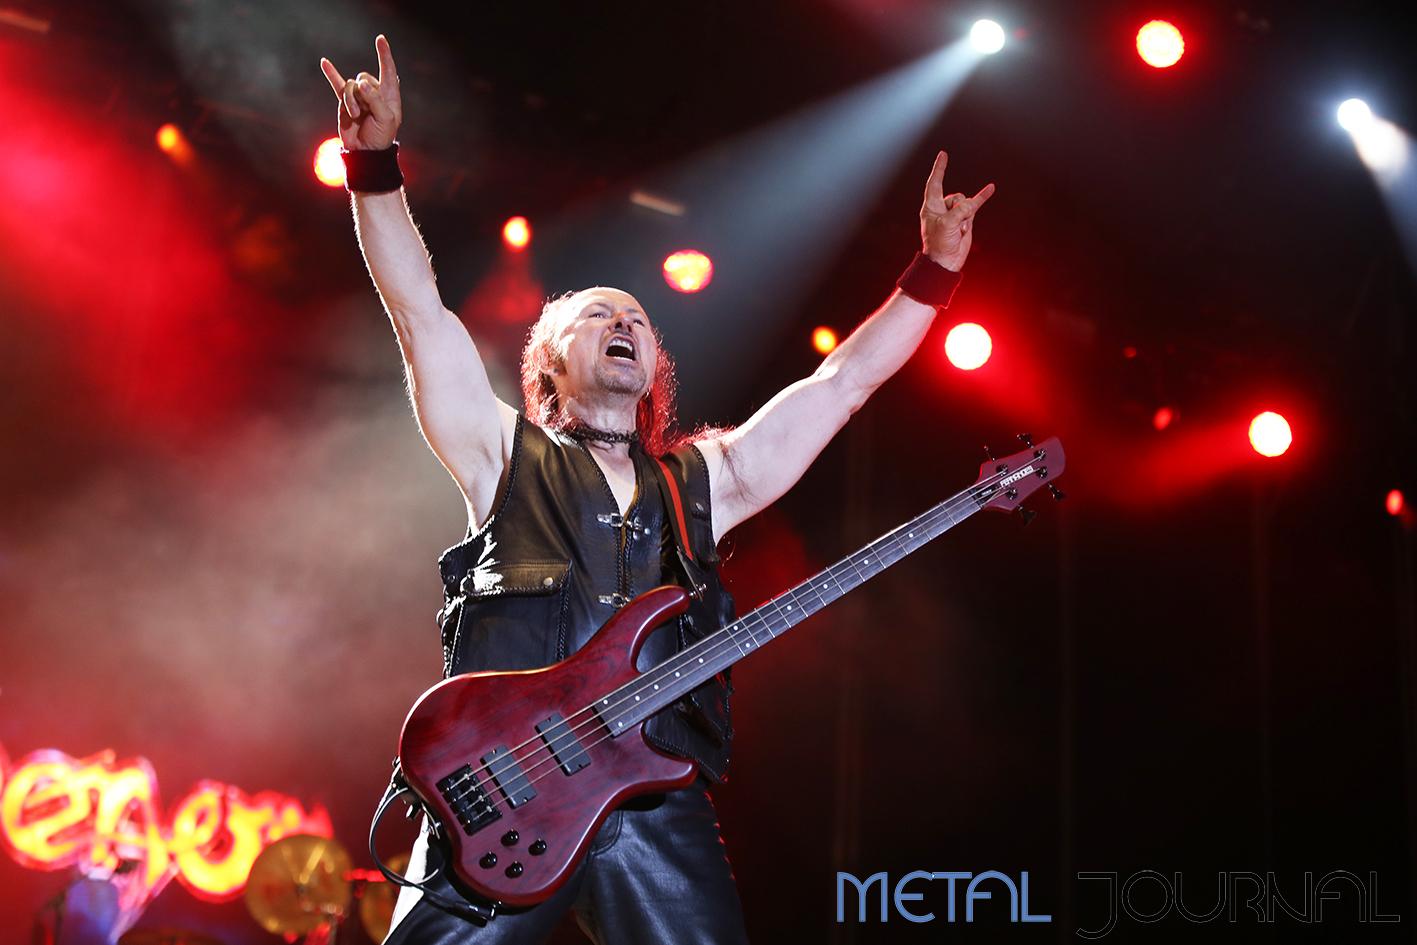 venom - metal journal rock fest barcelona 2019 pic 5